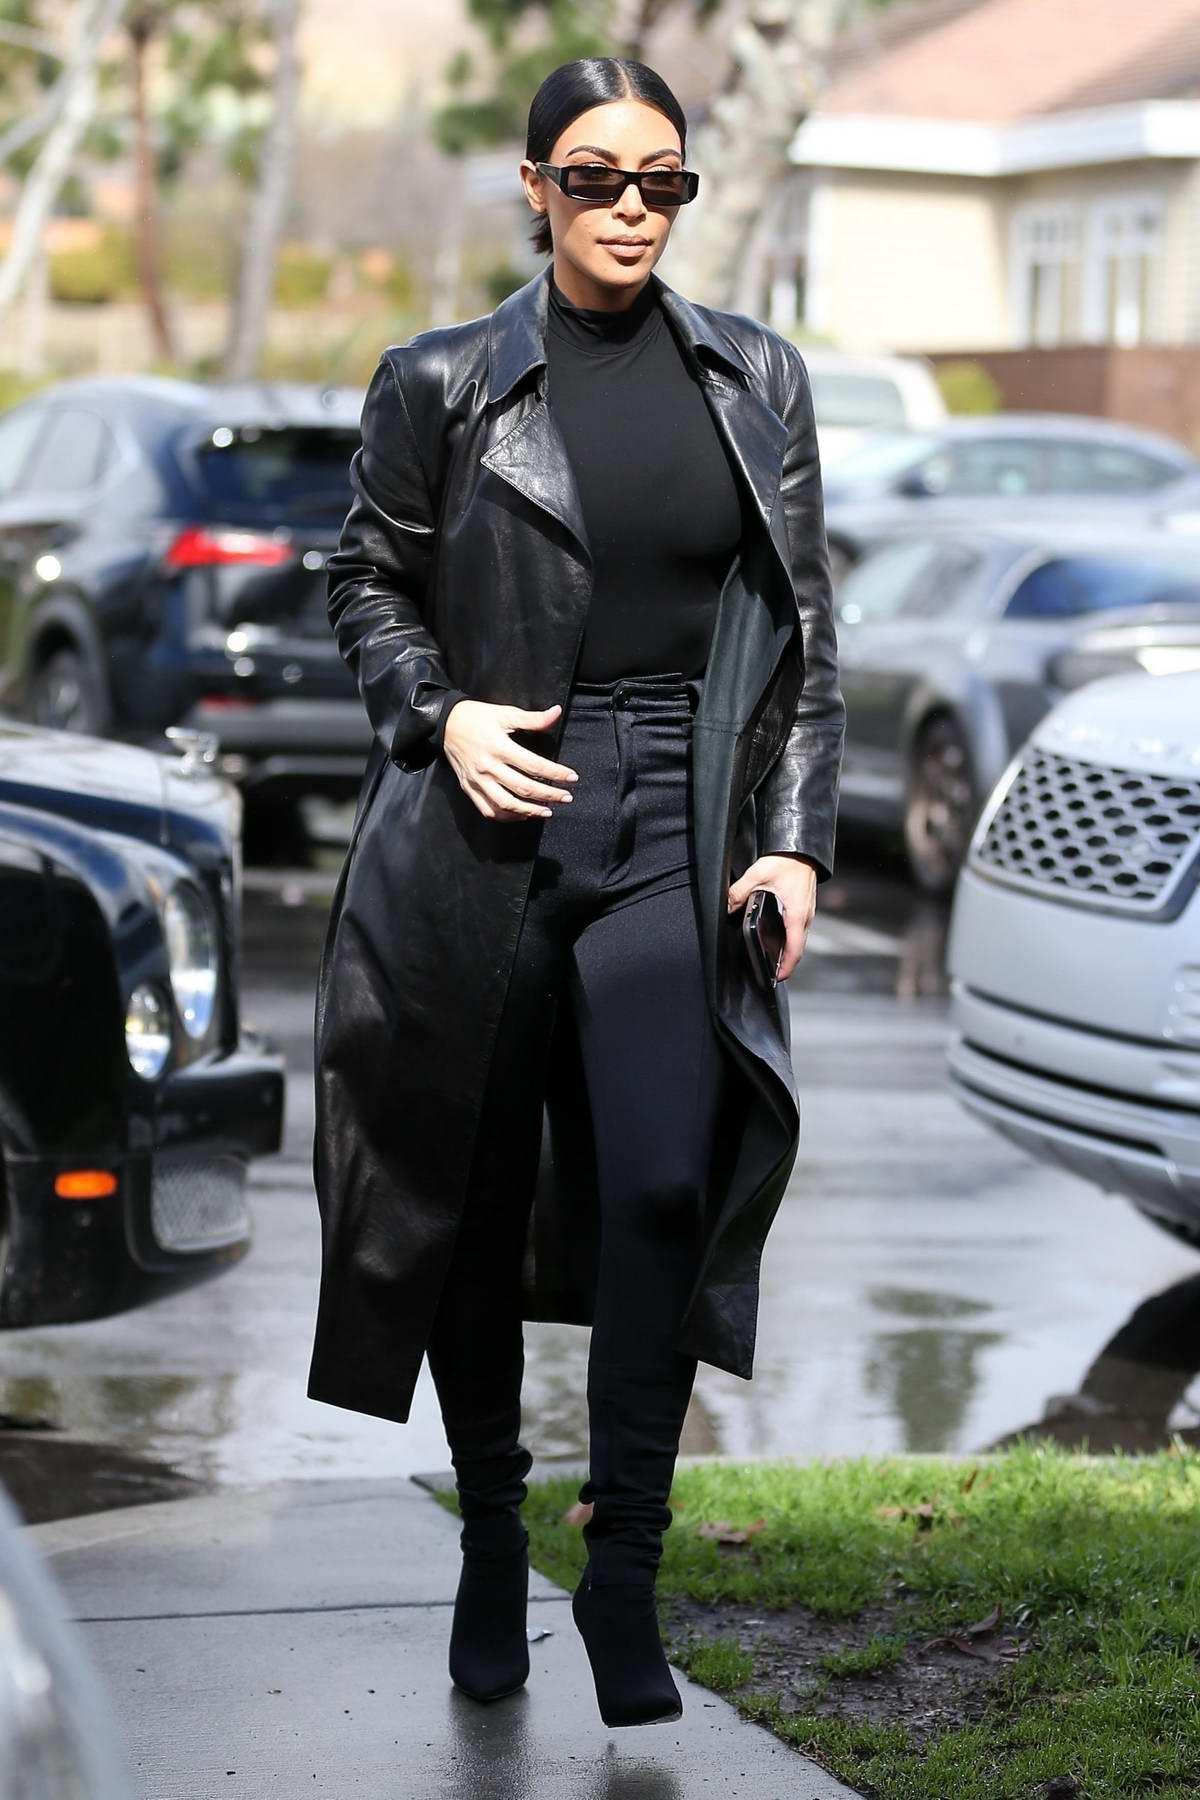 Kim Kardashian dons all black as she joins Kourtney Kardashian and Scott Disick for lunch in Los Angeles